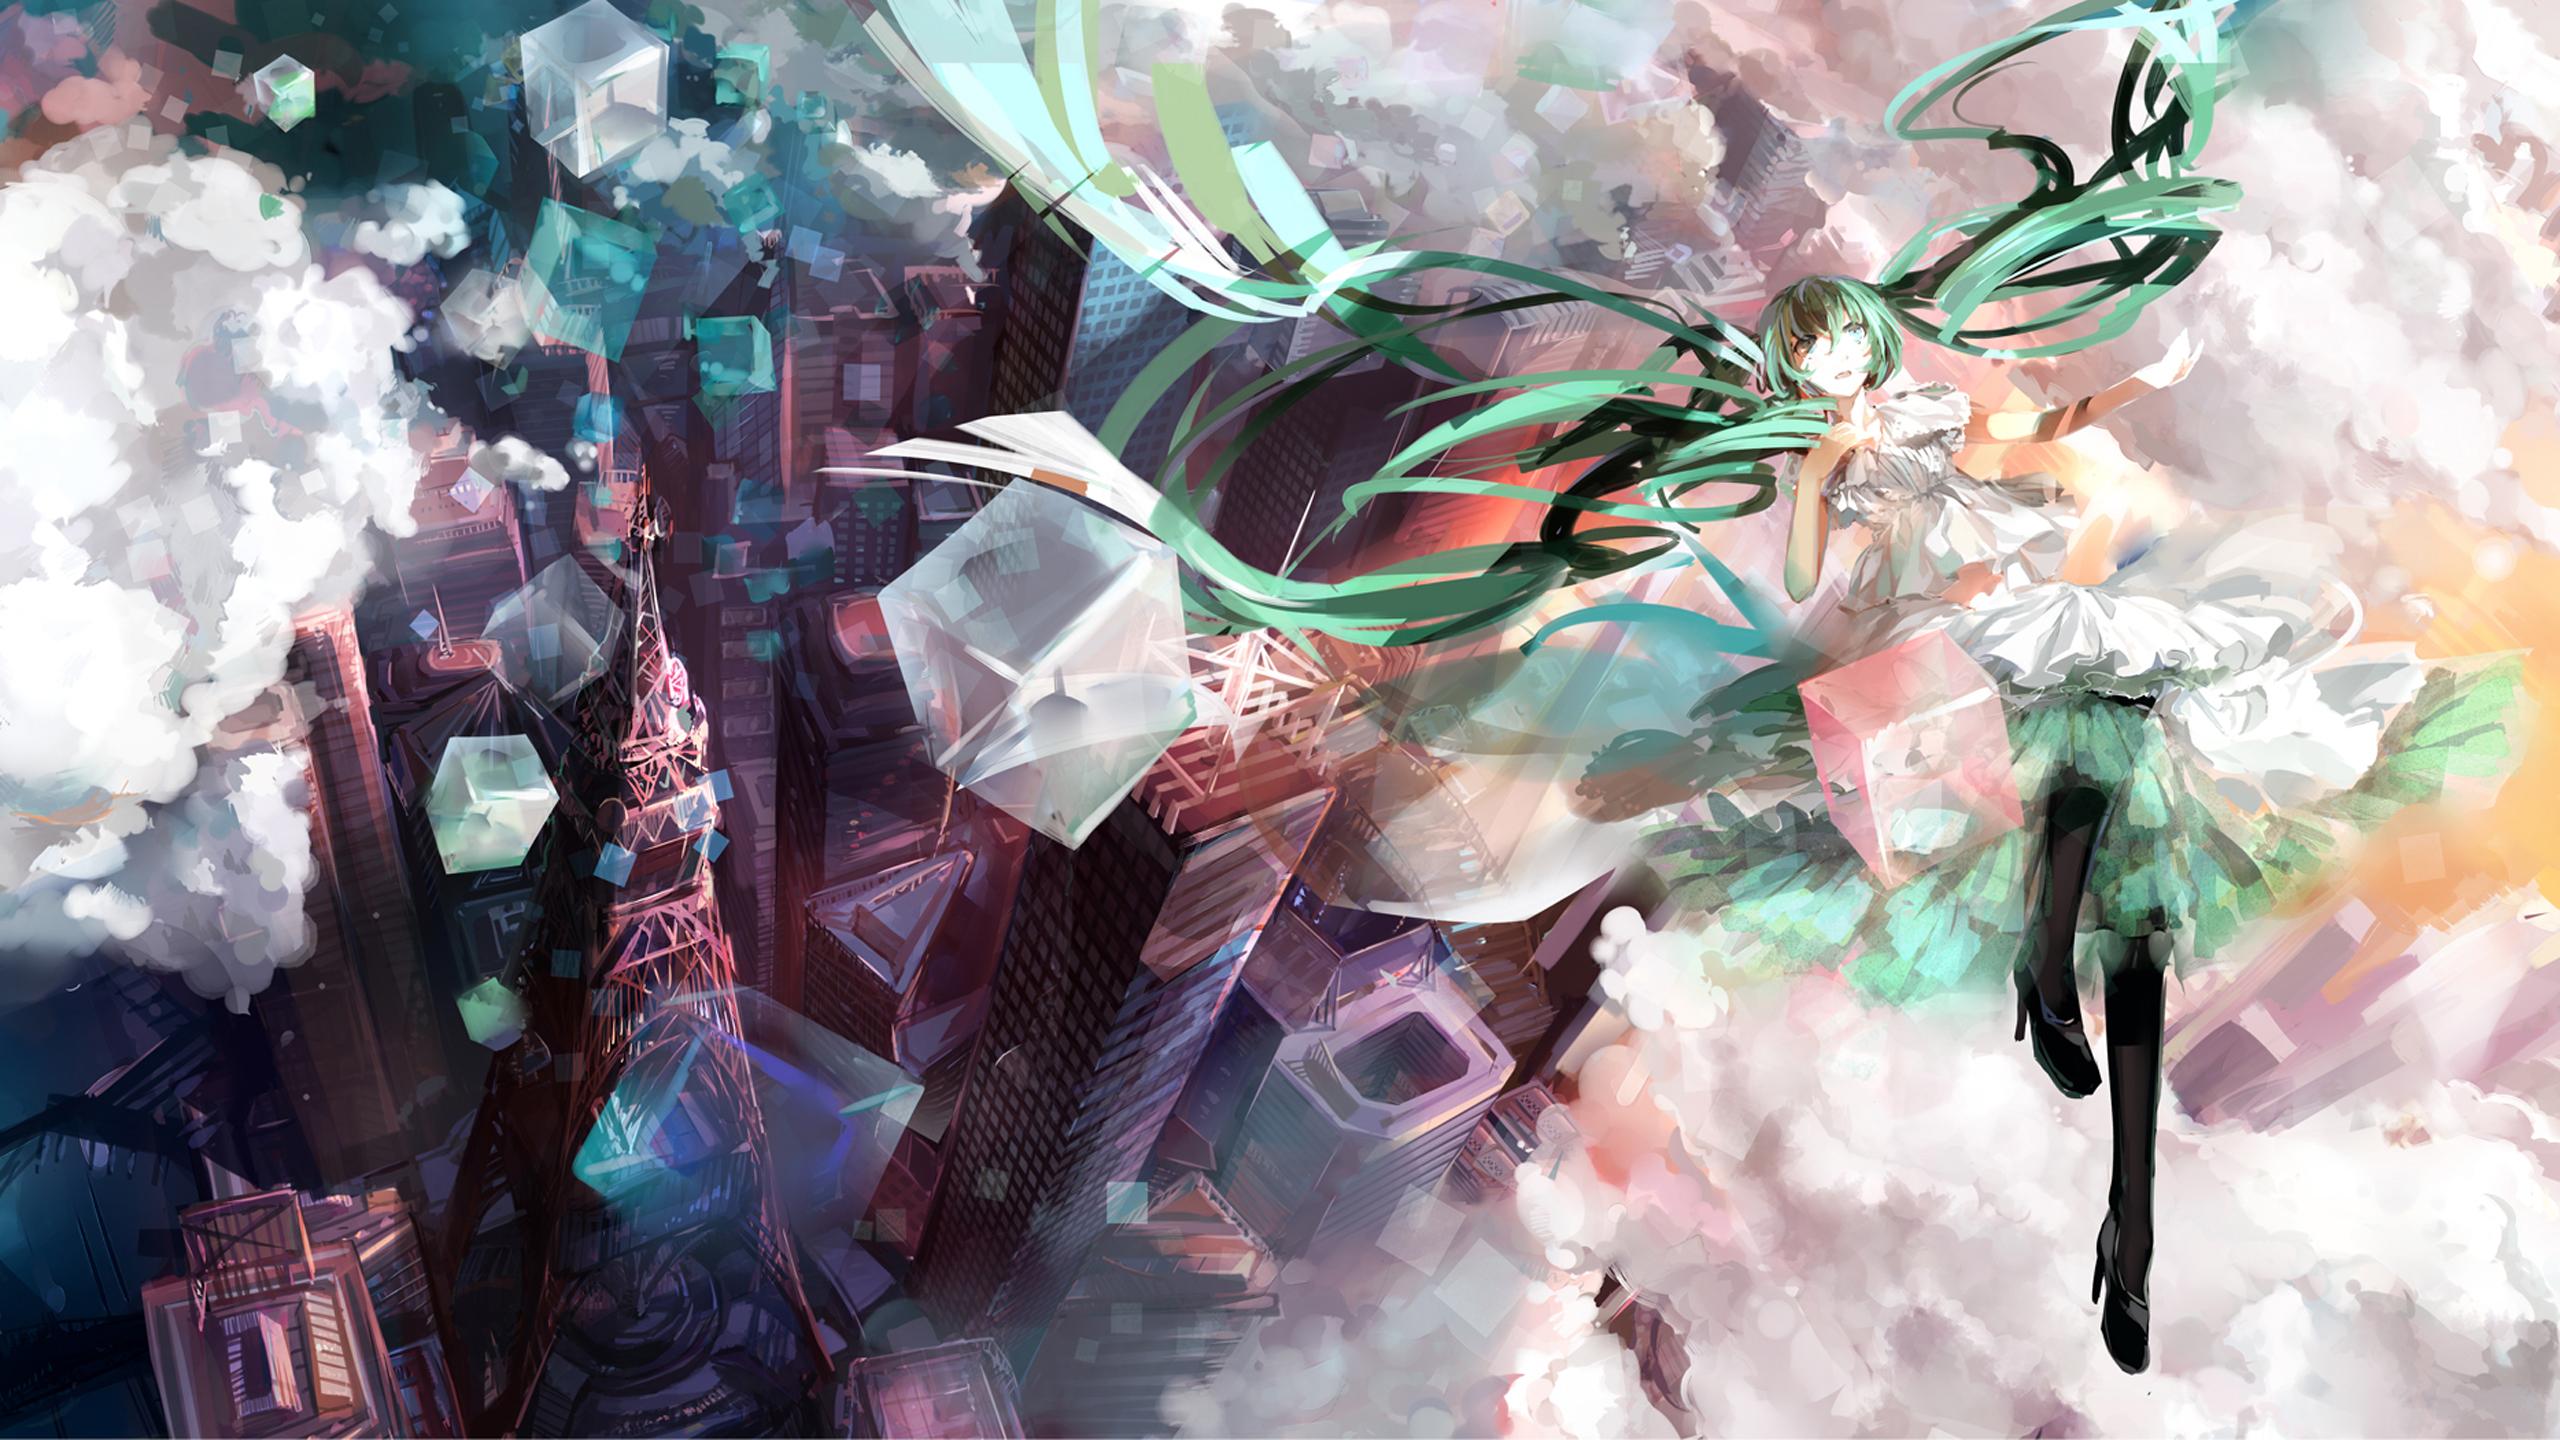 Download 7000 Wallpaper Abyss Miku HD Paling Baru